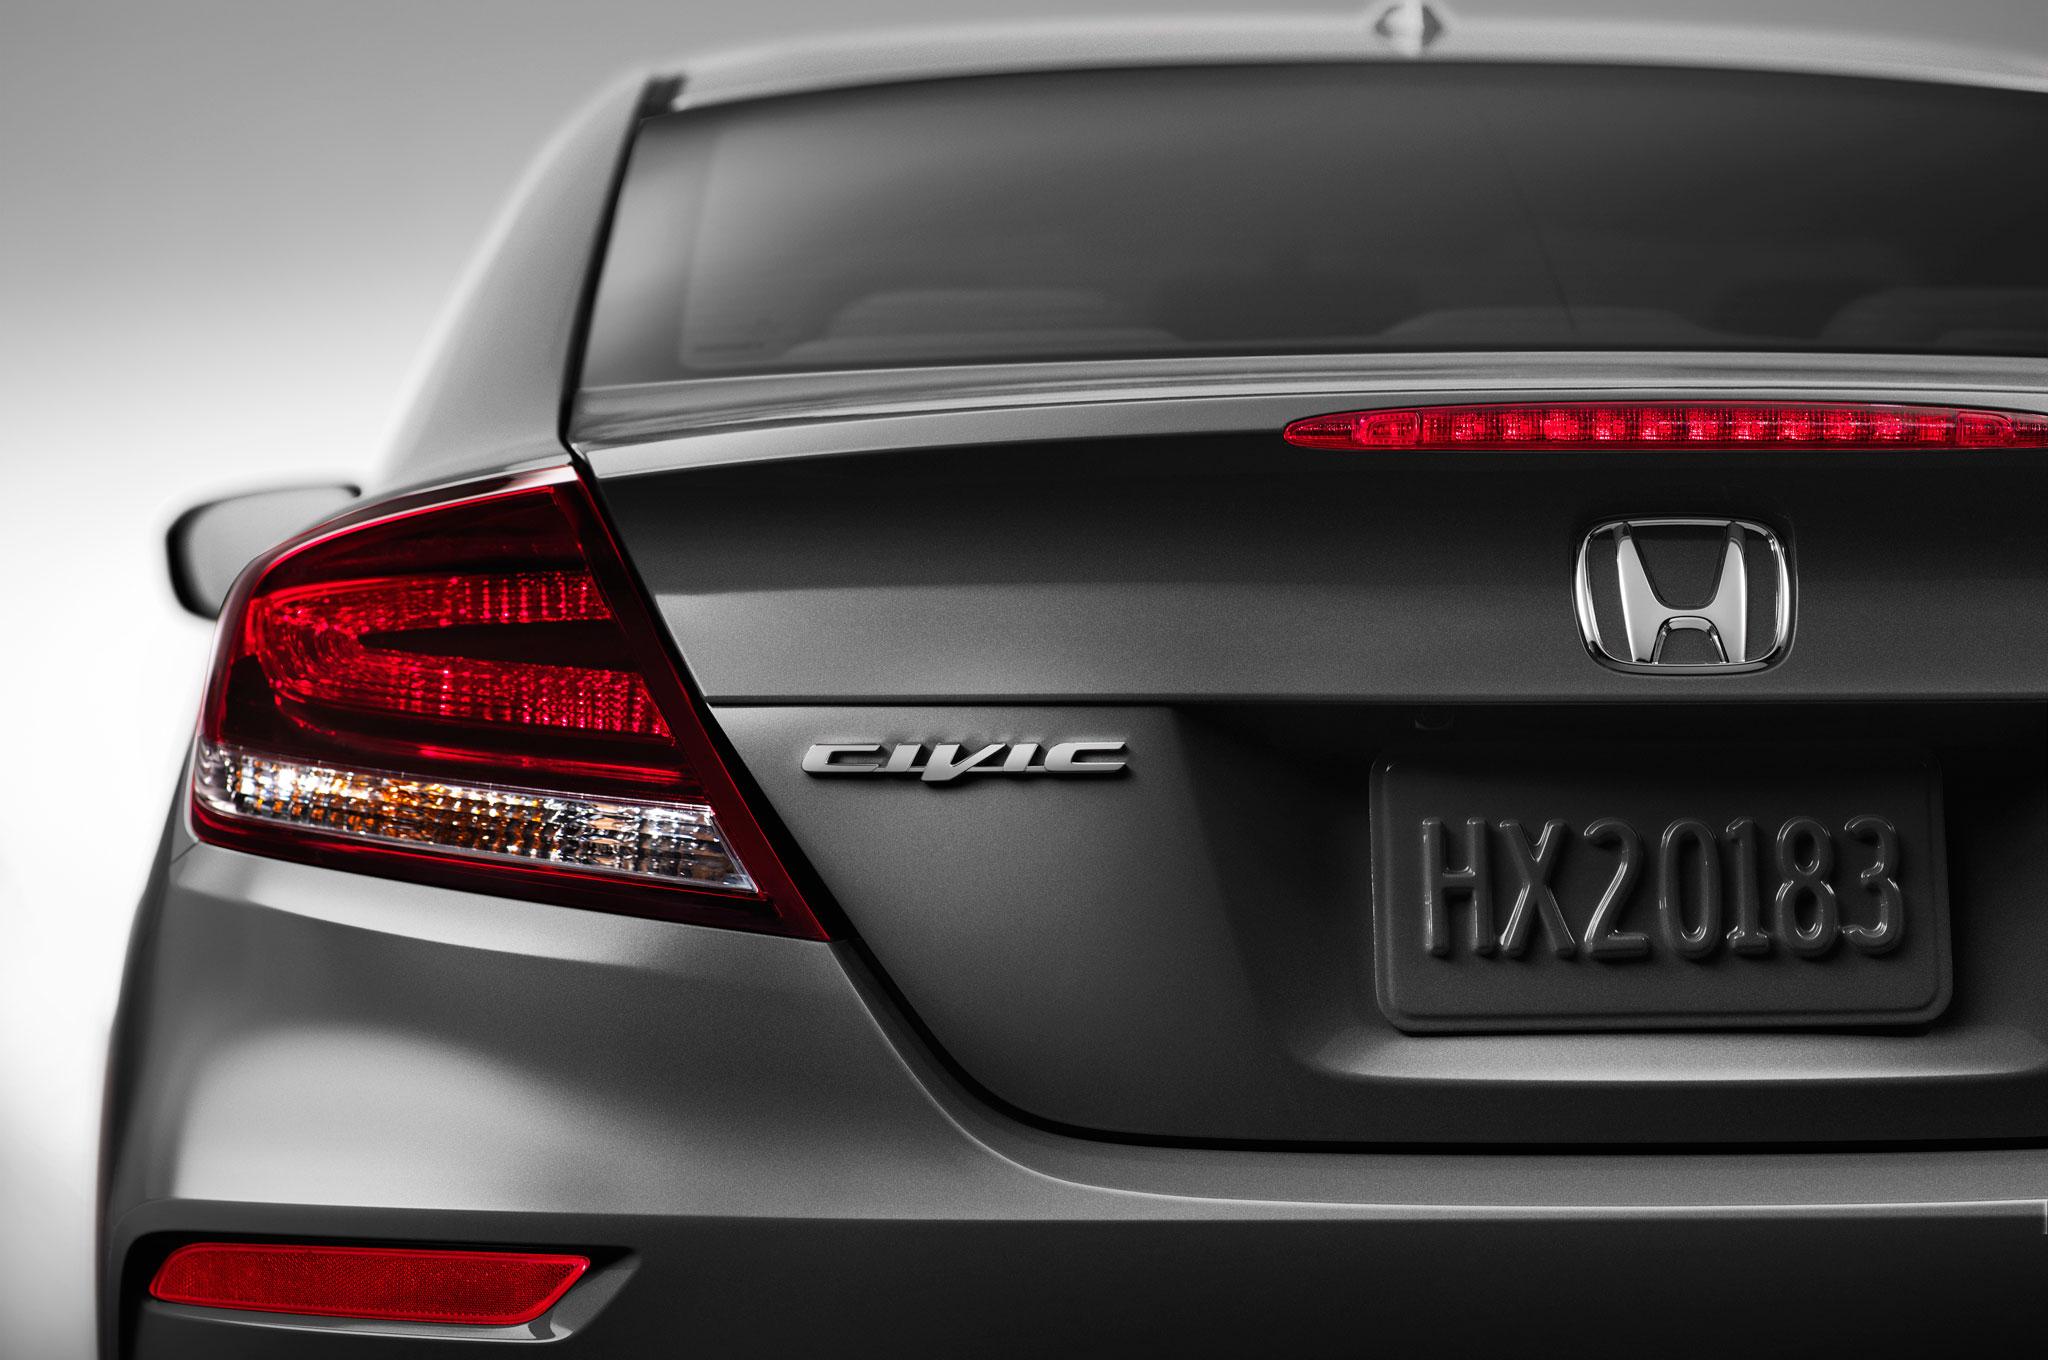 2015 Honda Civic Driver Side Tail Lamp 1